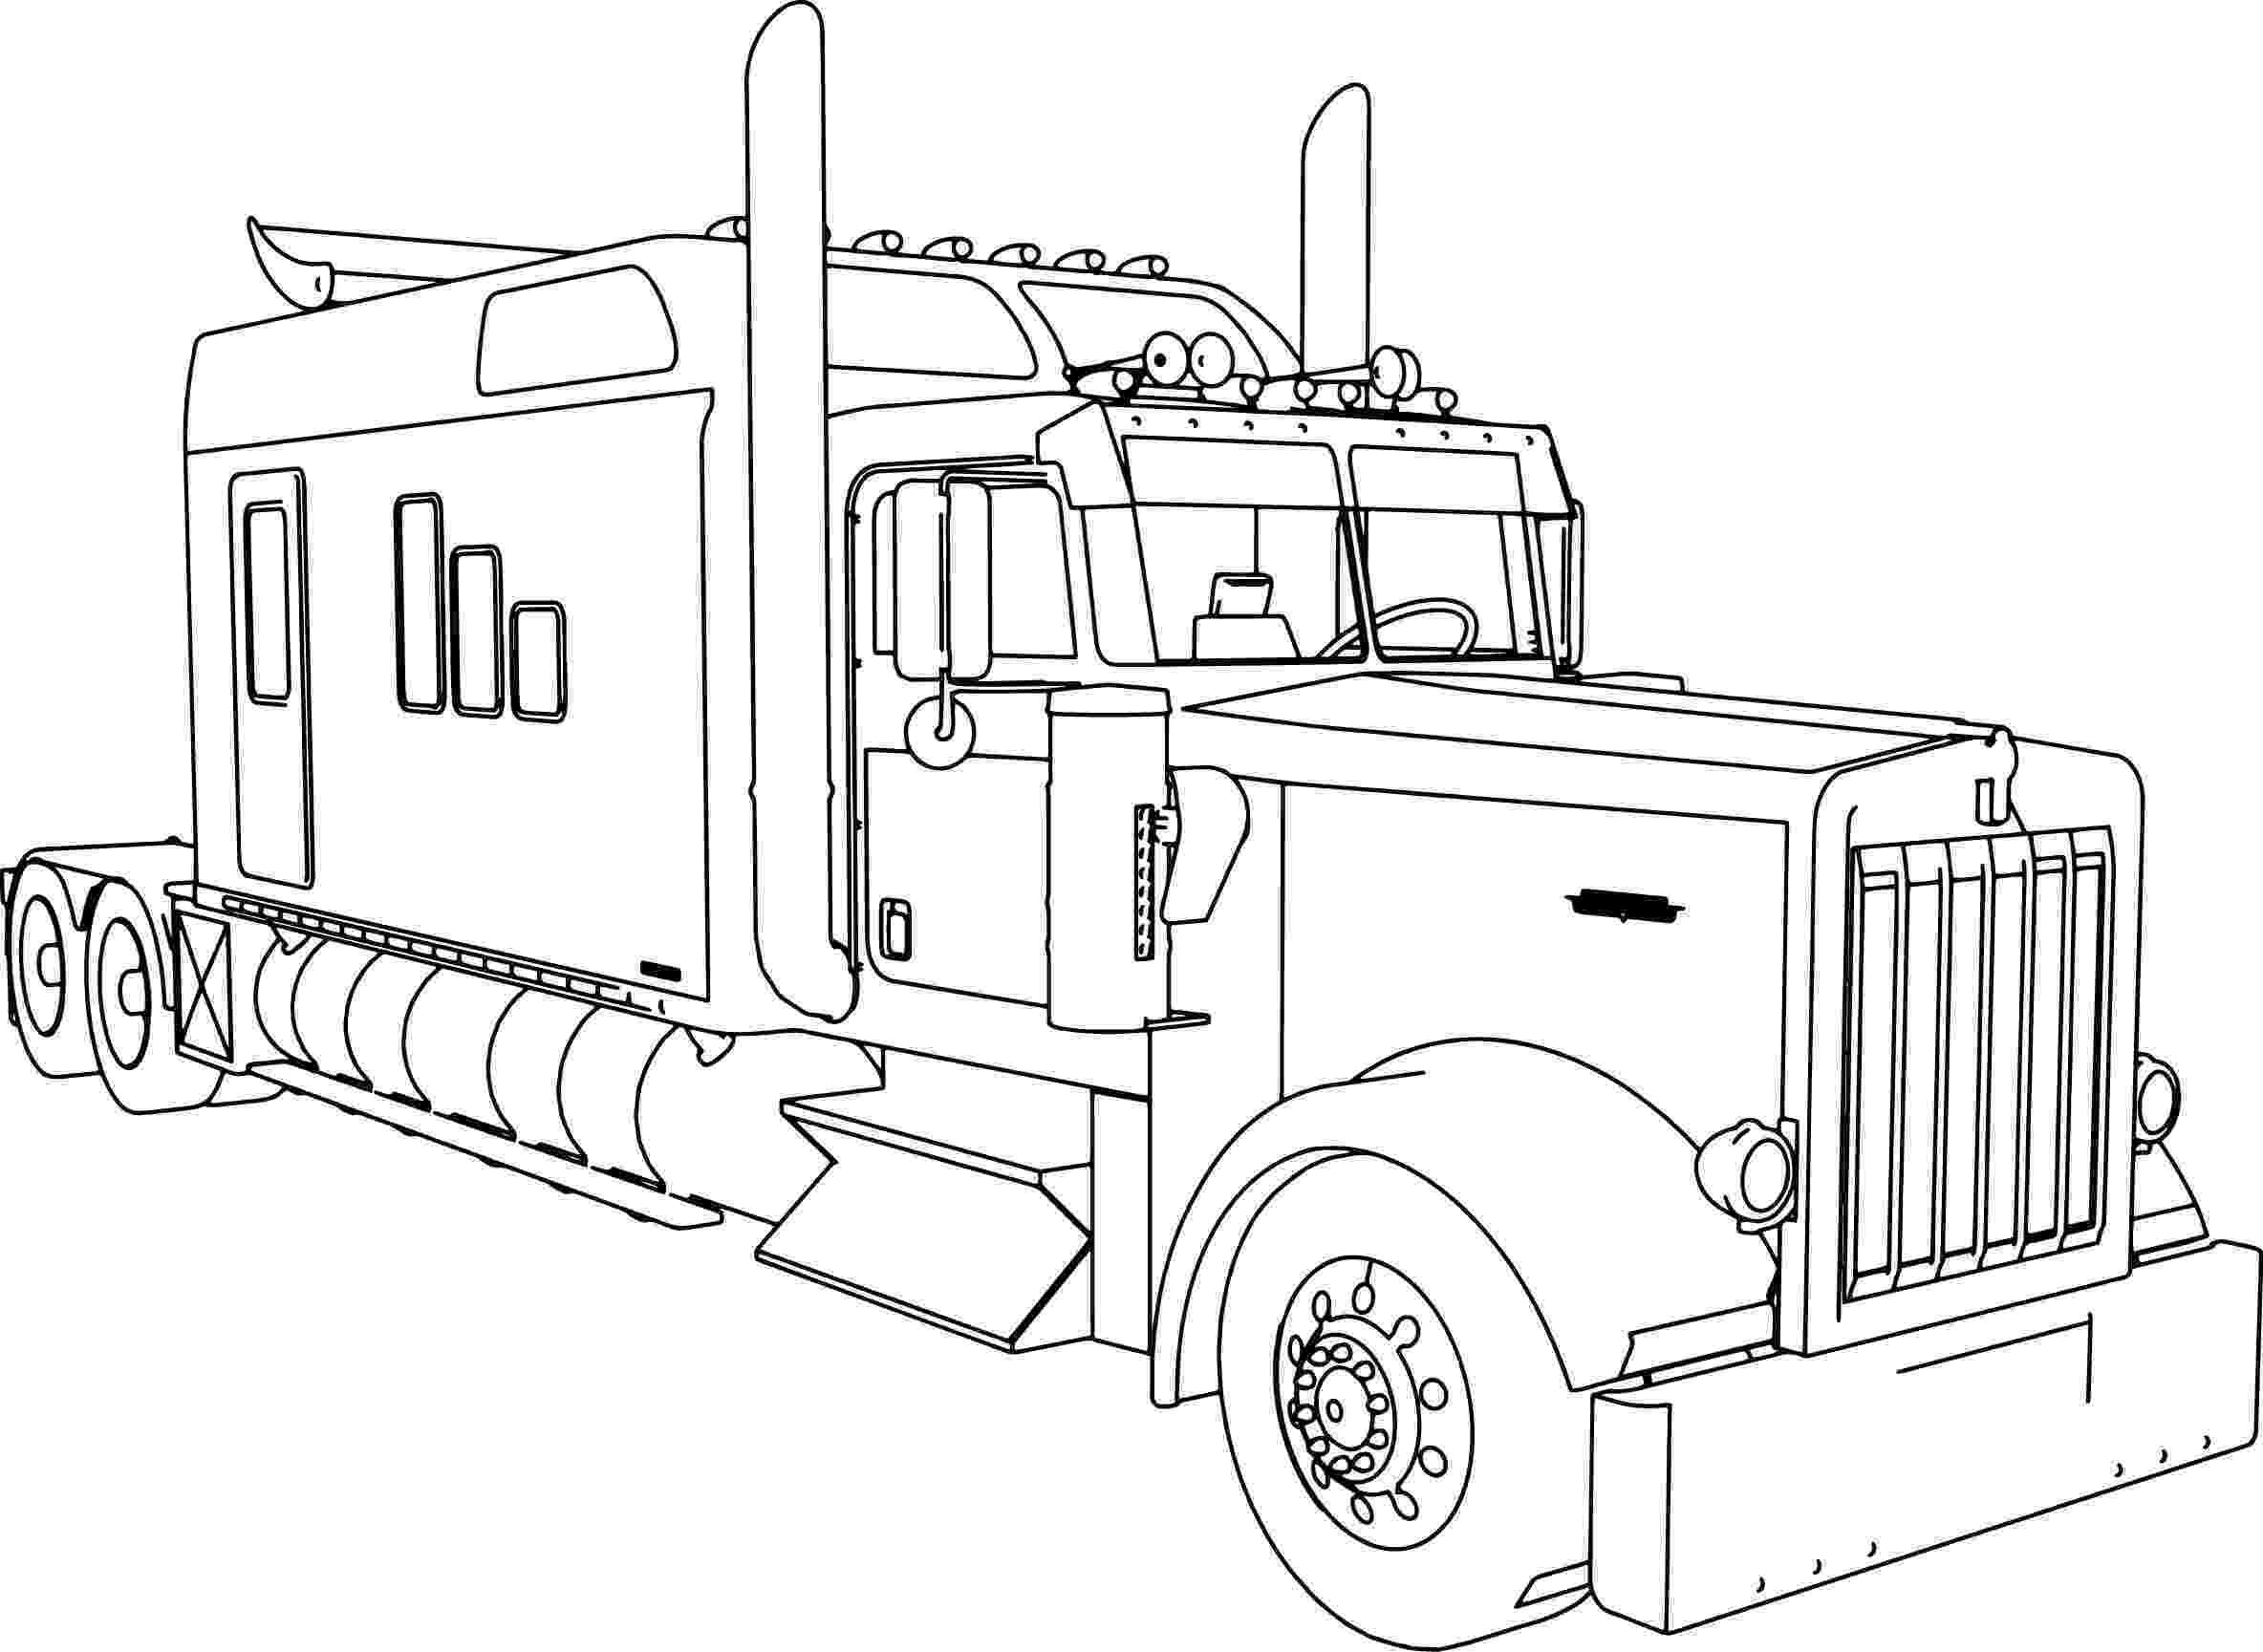 coloring pages of semi trucks kenworth w900 custom m long trailer truck coloring page coloring pages semi trucks of